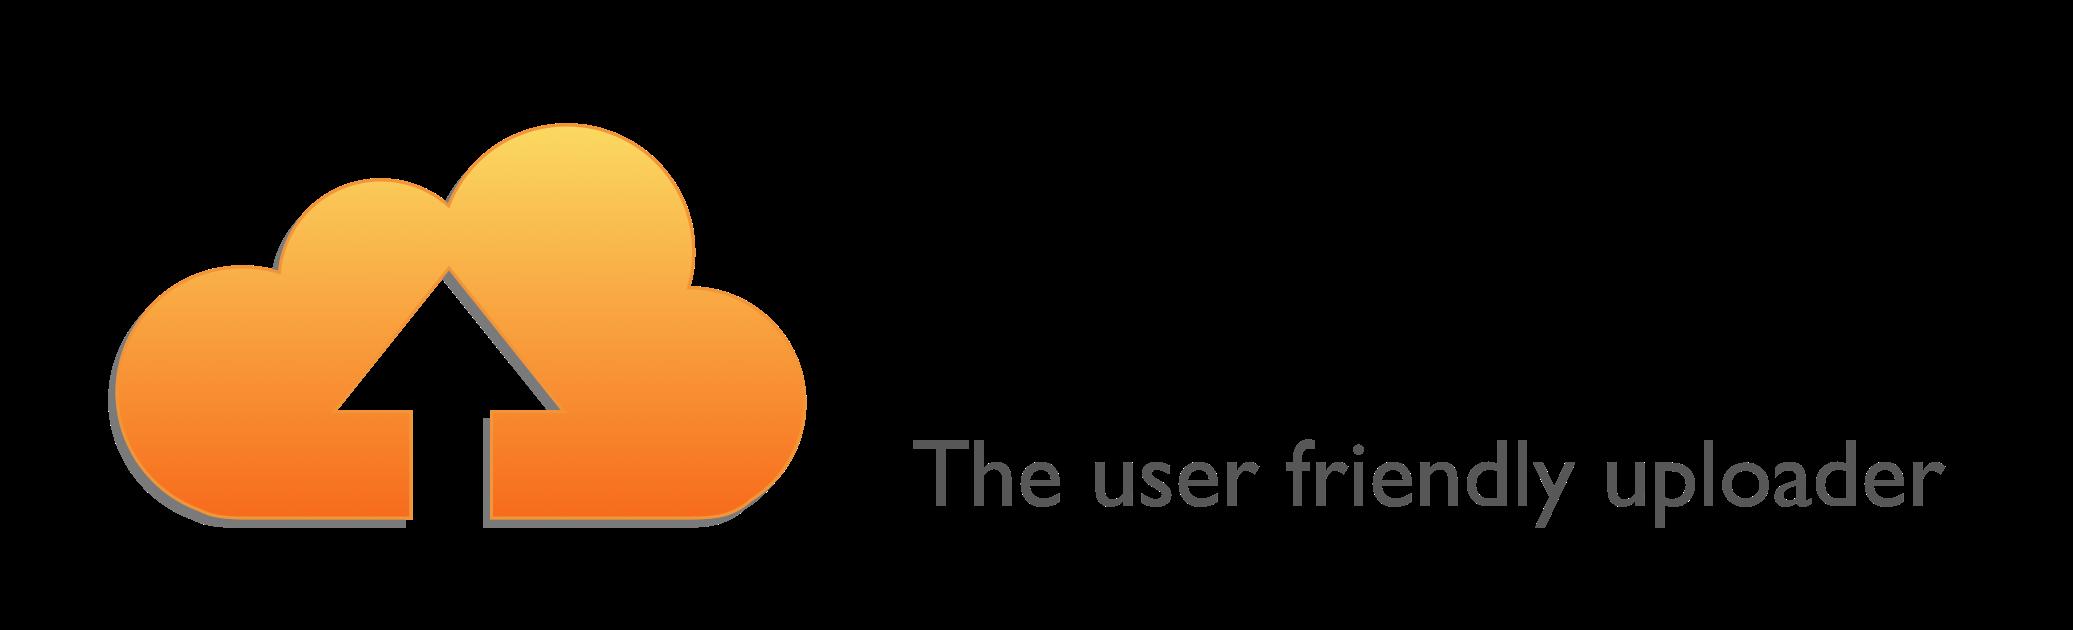 Push - The user friendly uploader